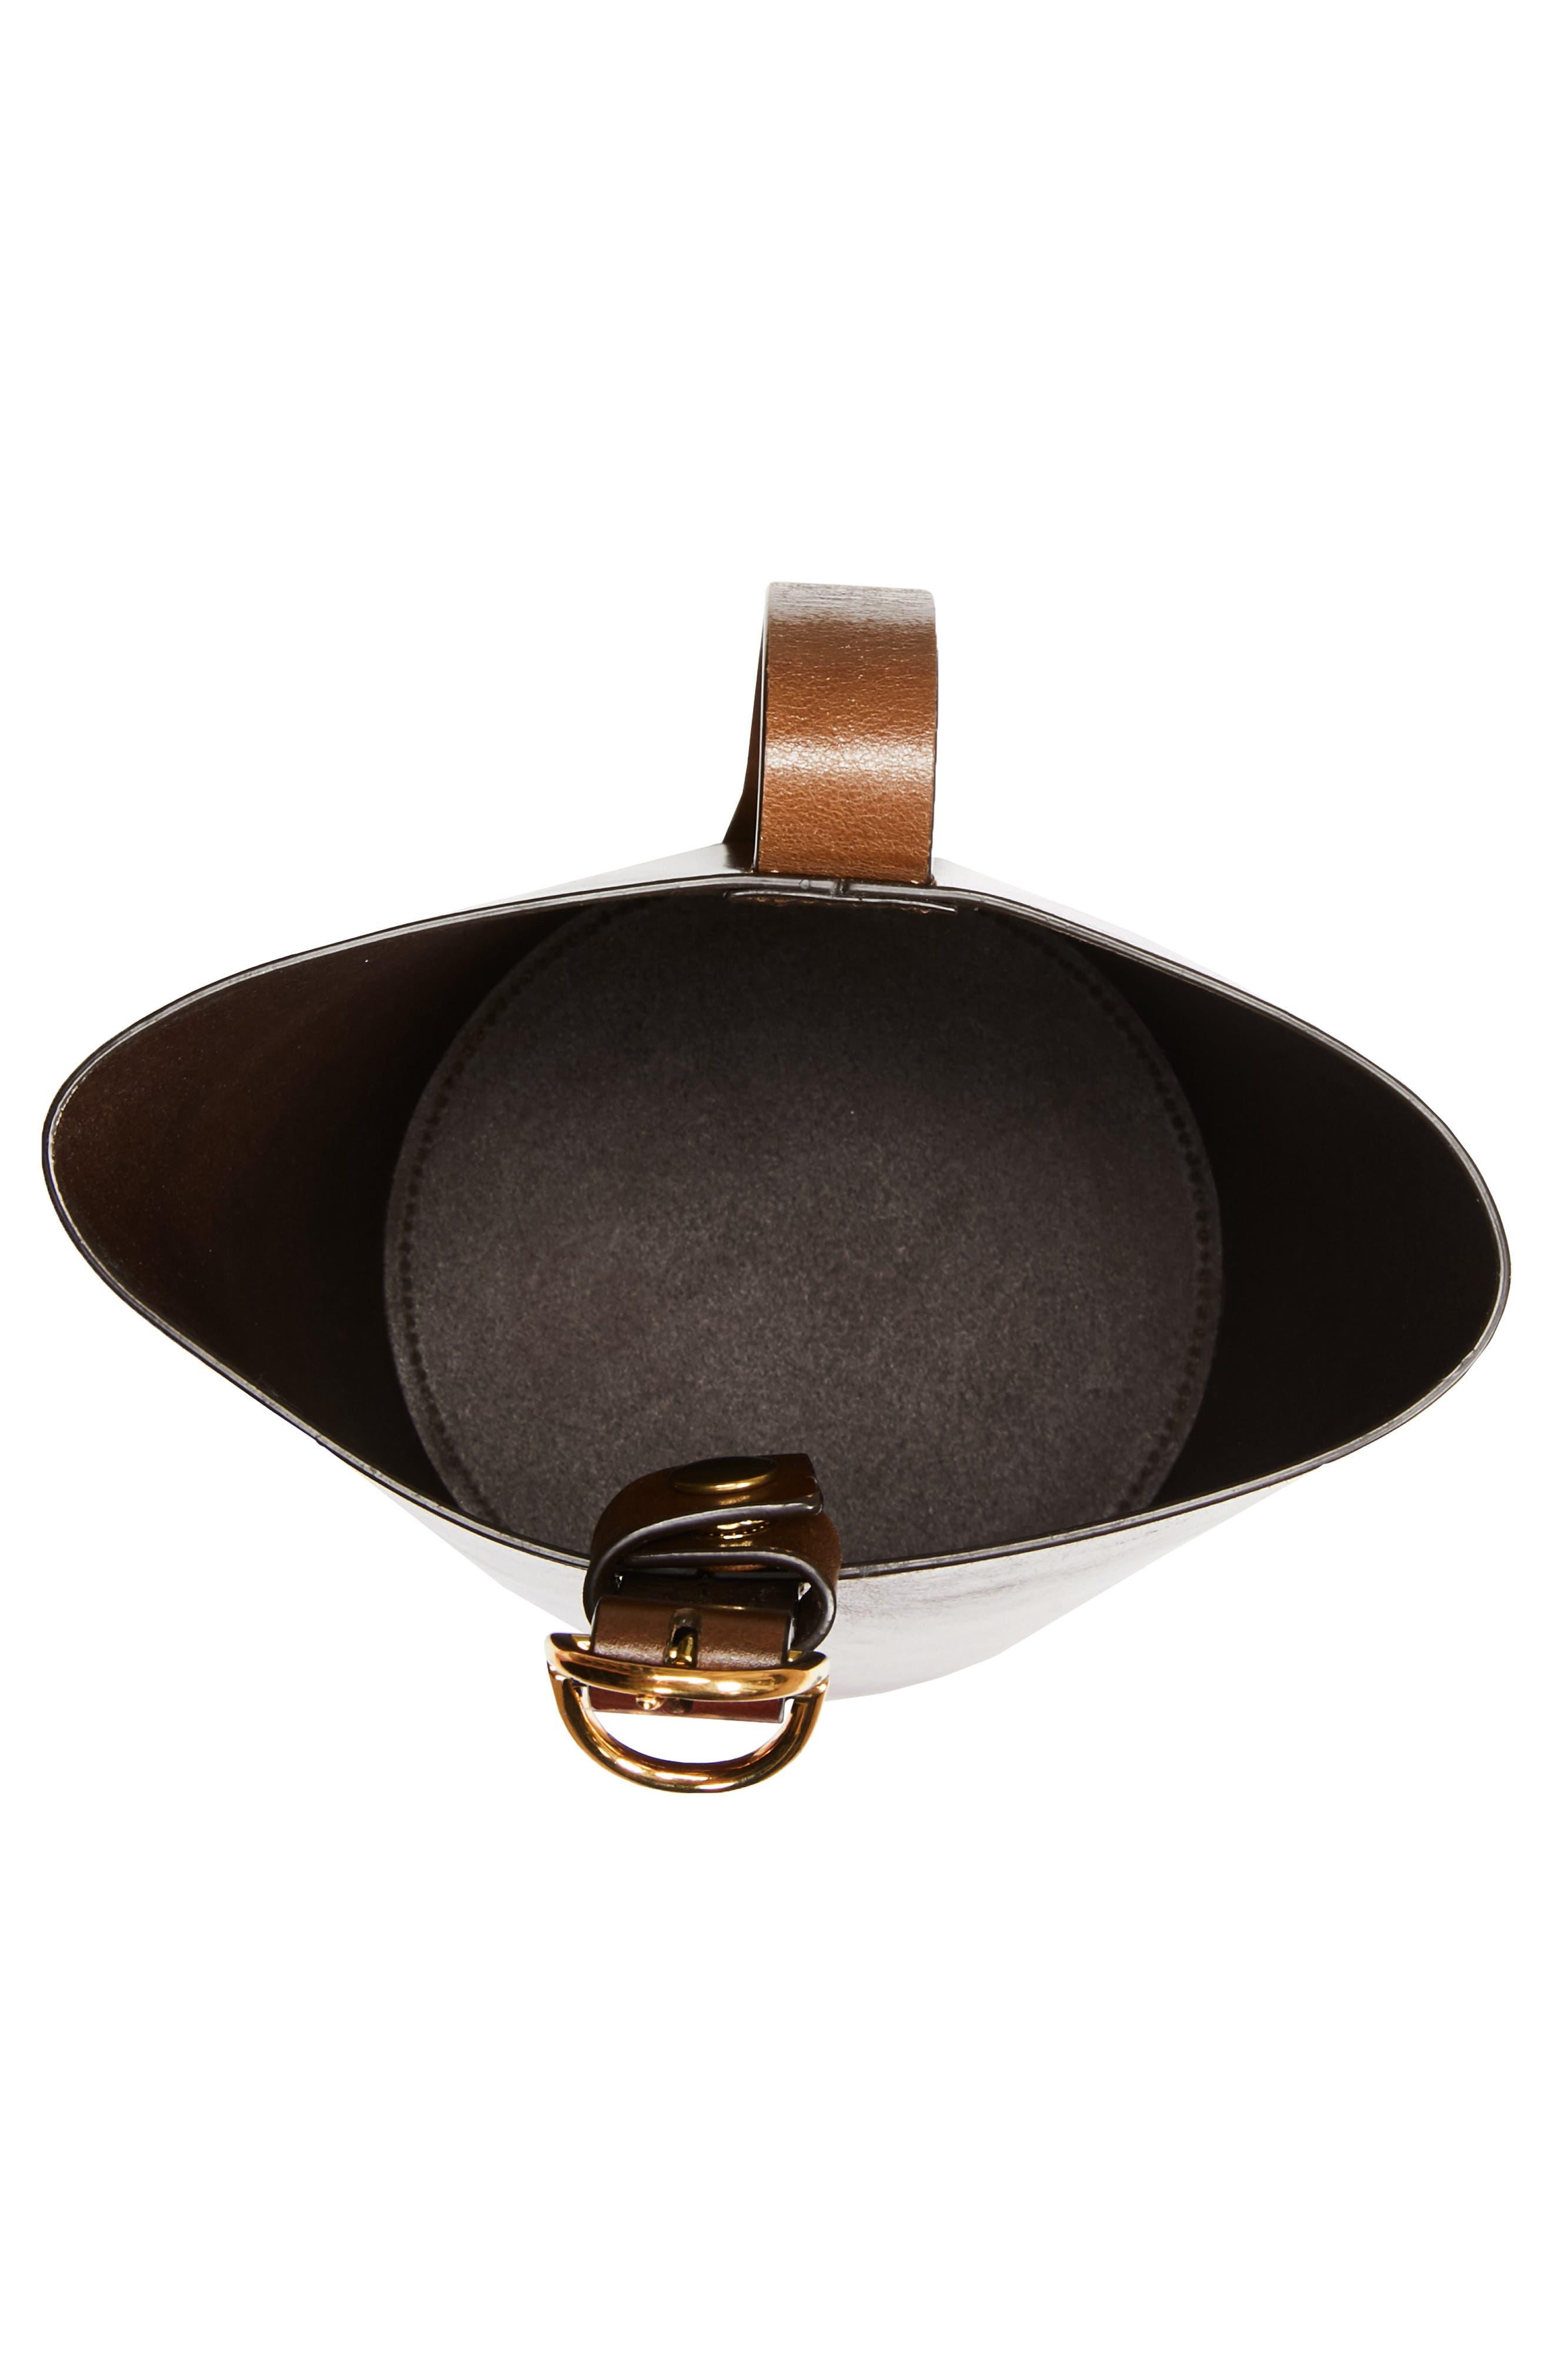 Small Leather Bucket Bag,                             Alternate thumbnail 4, color,                             SADDLE/ SADDLE